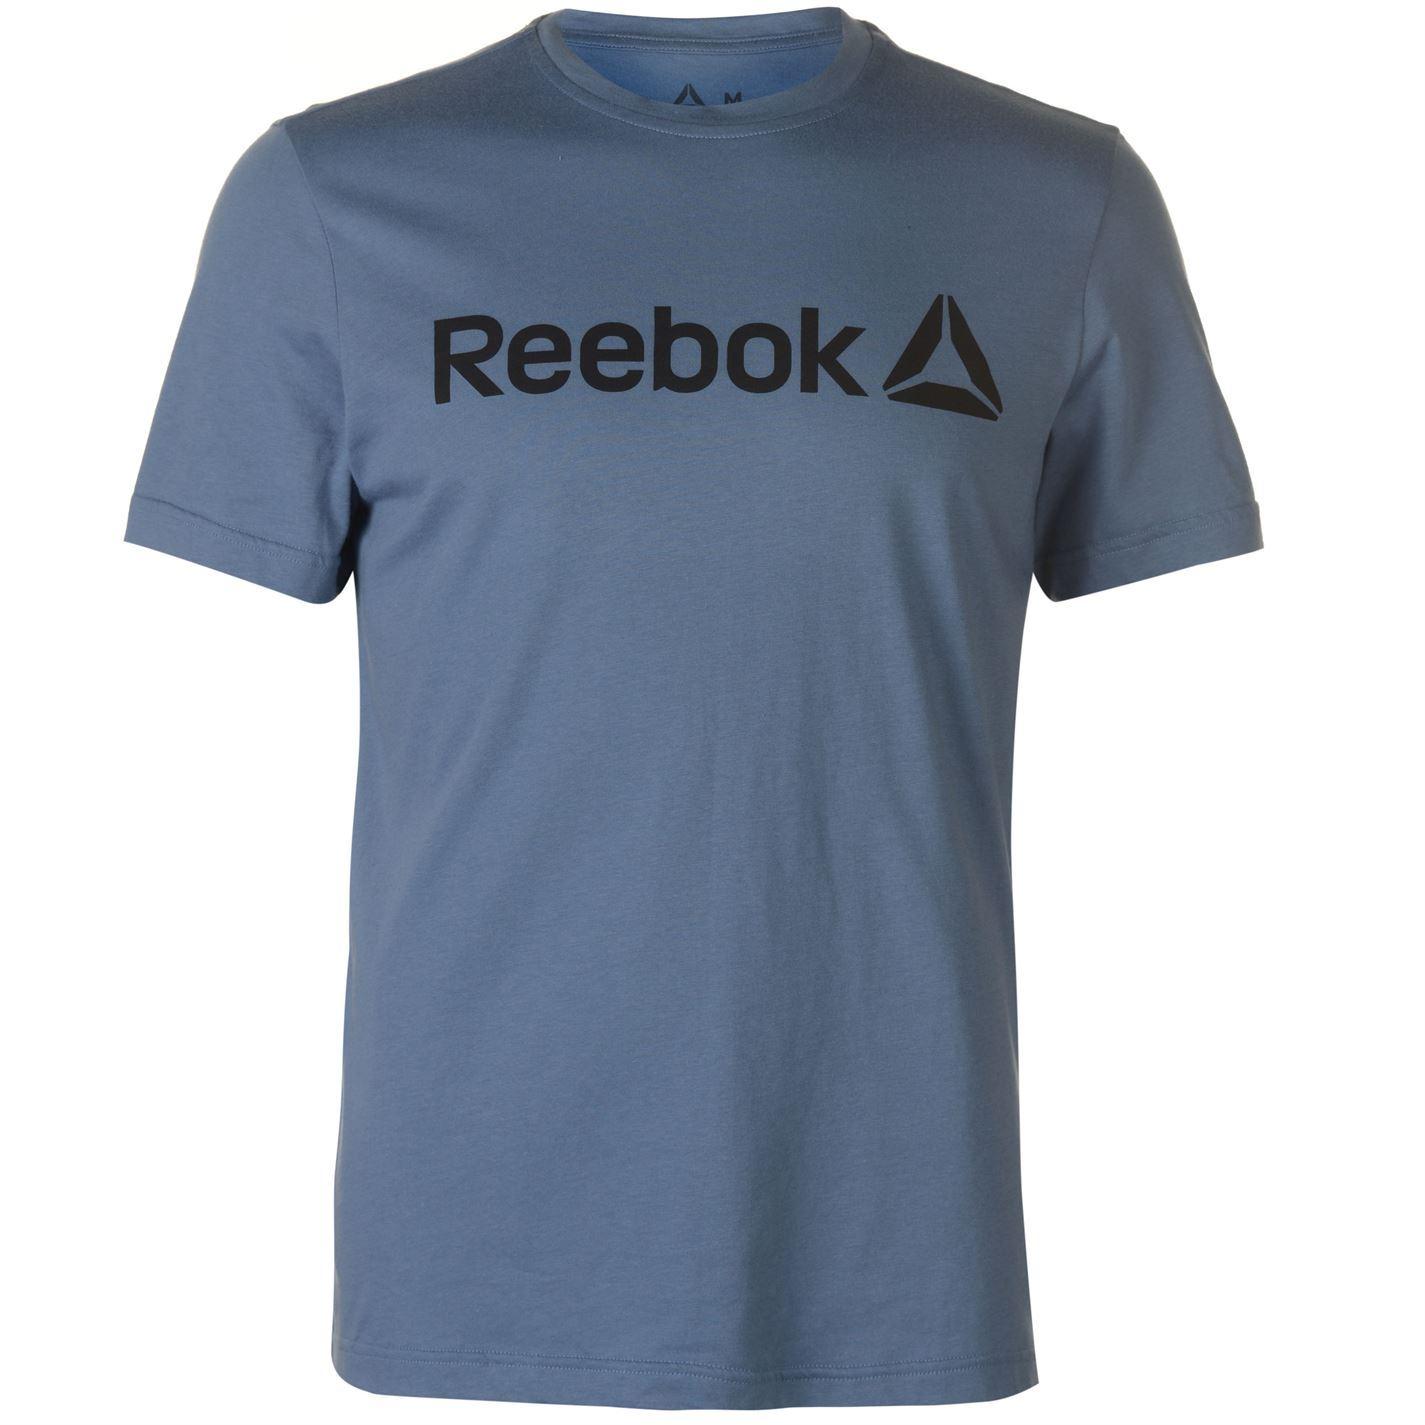 Reebok-Delta-Logo-T-Shirt-Mens-Tee-Shirt-Top thumbnail 14